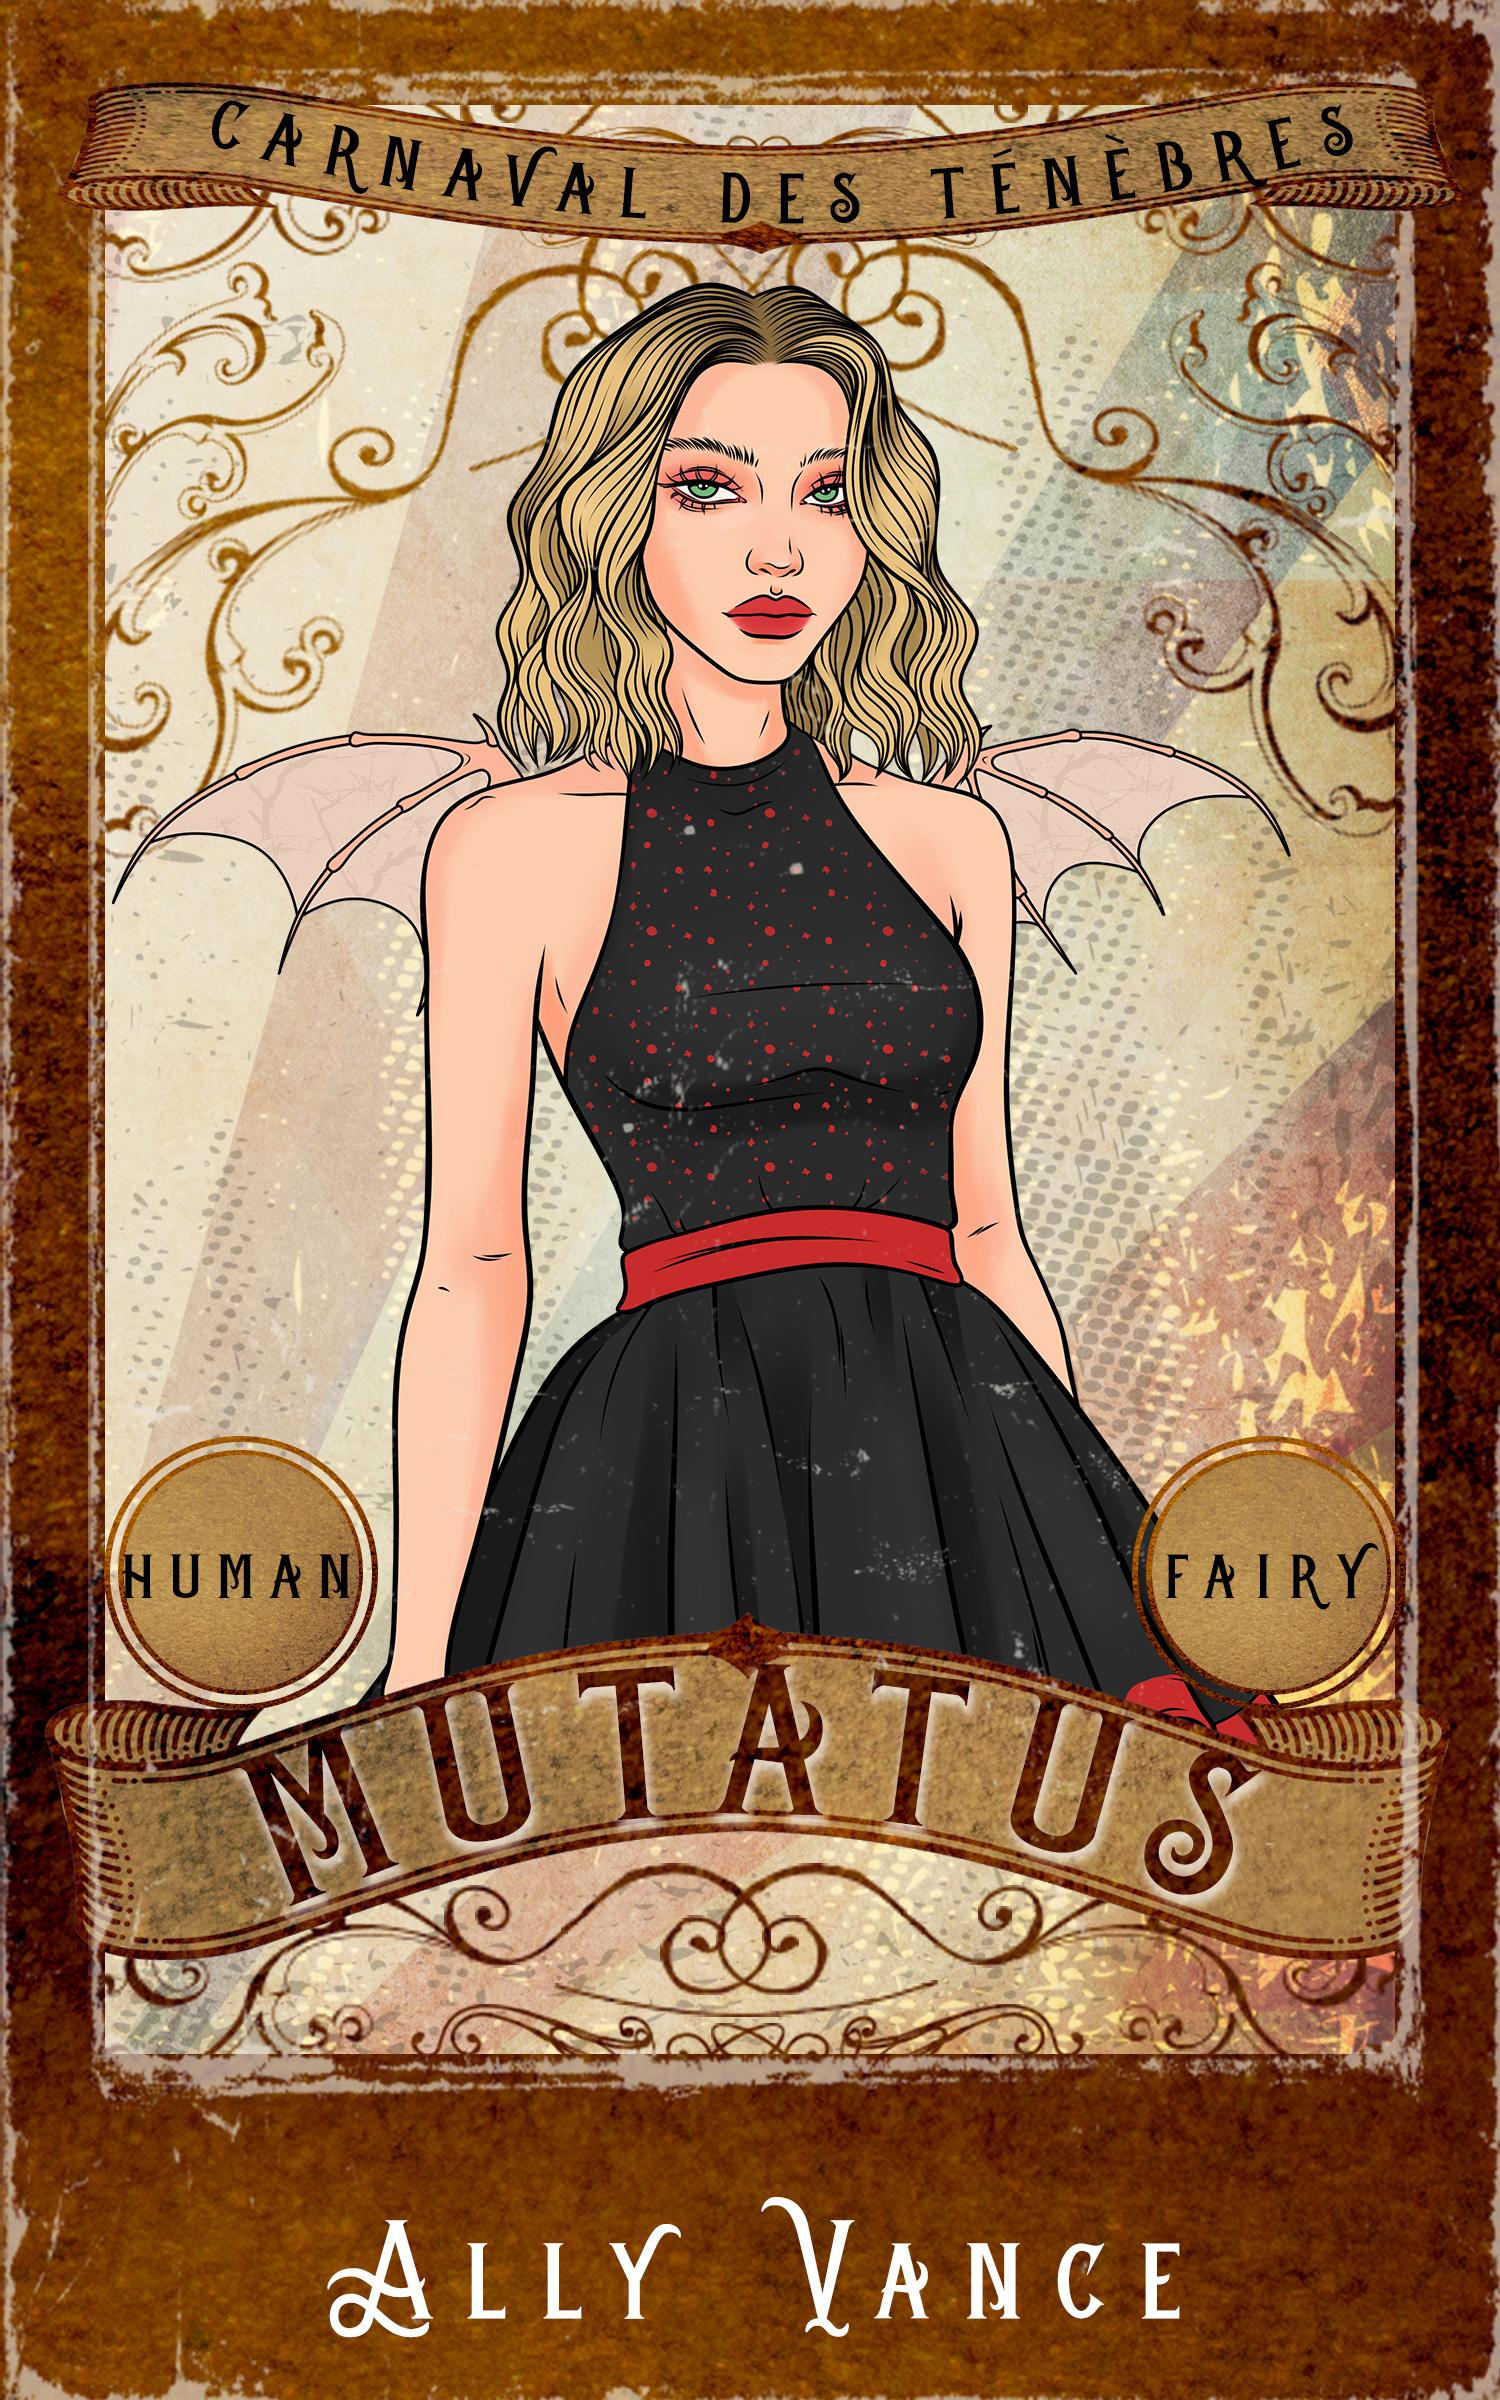 Mutatus (Carnaval des Ténèbres, #3)